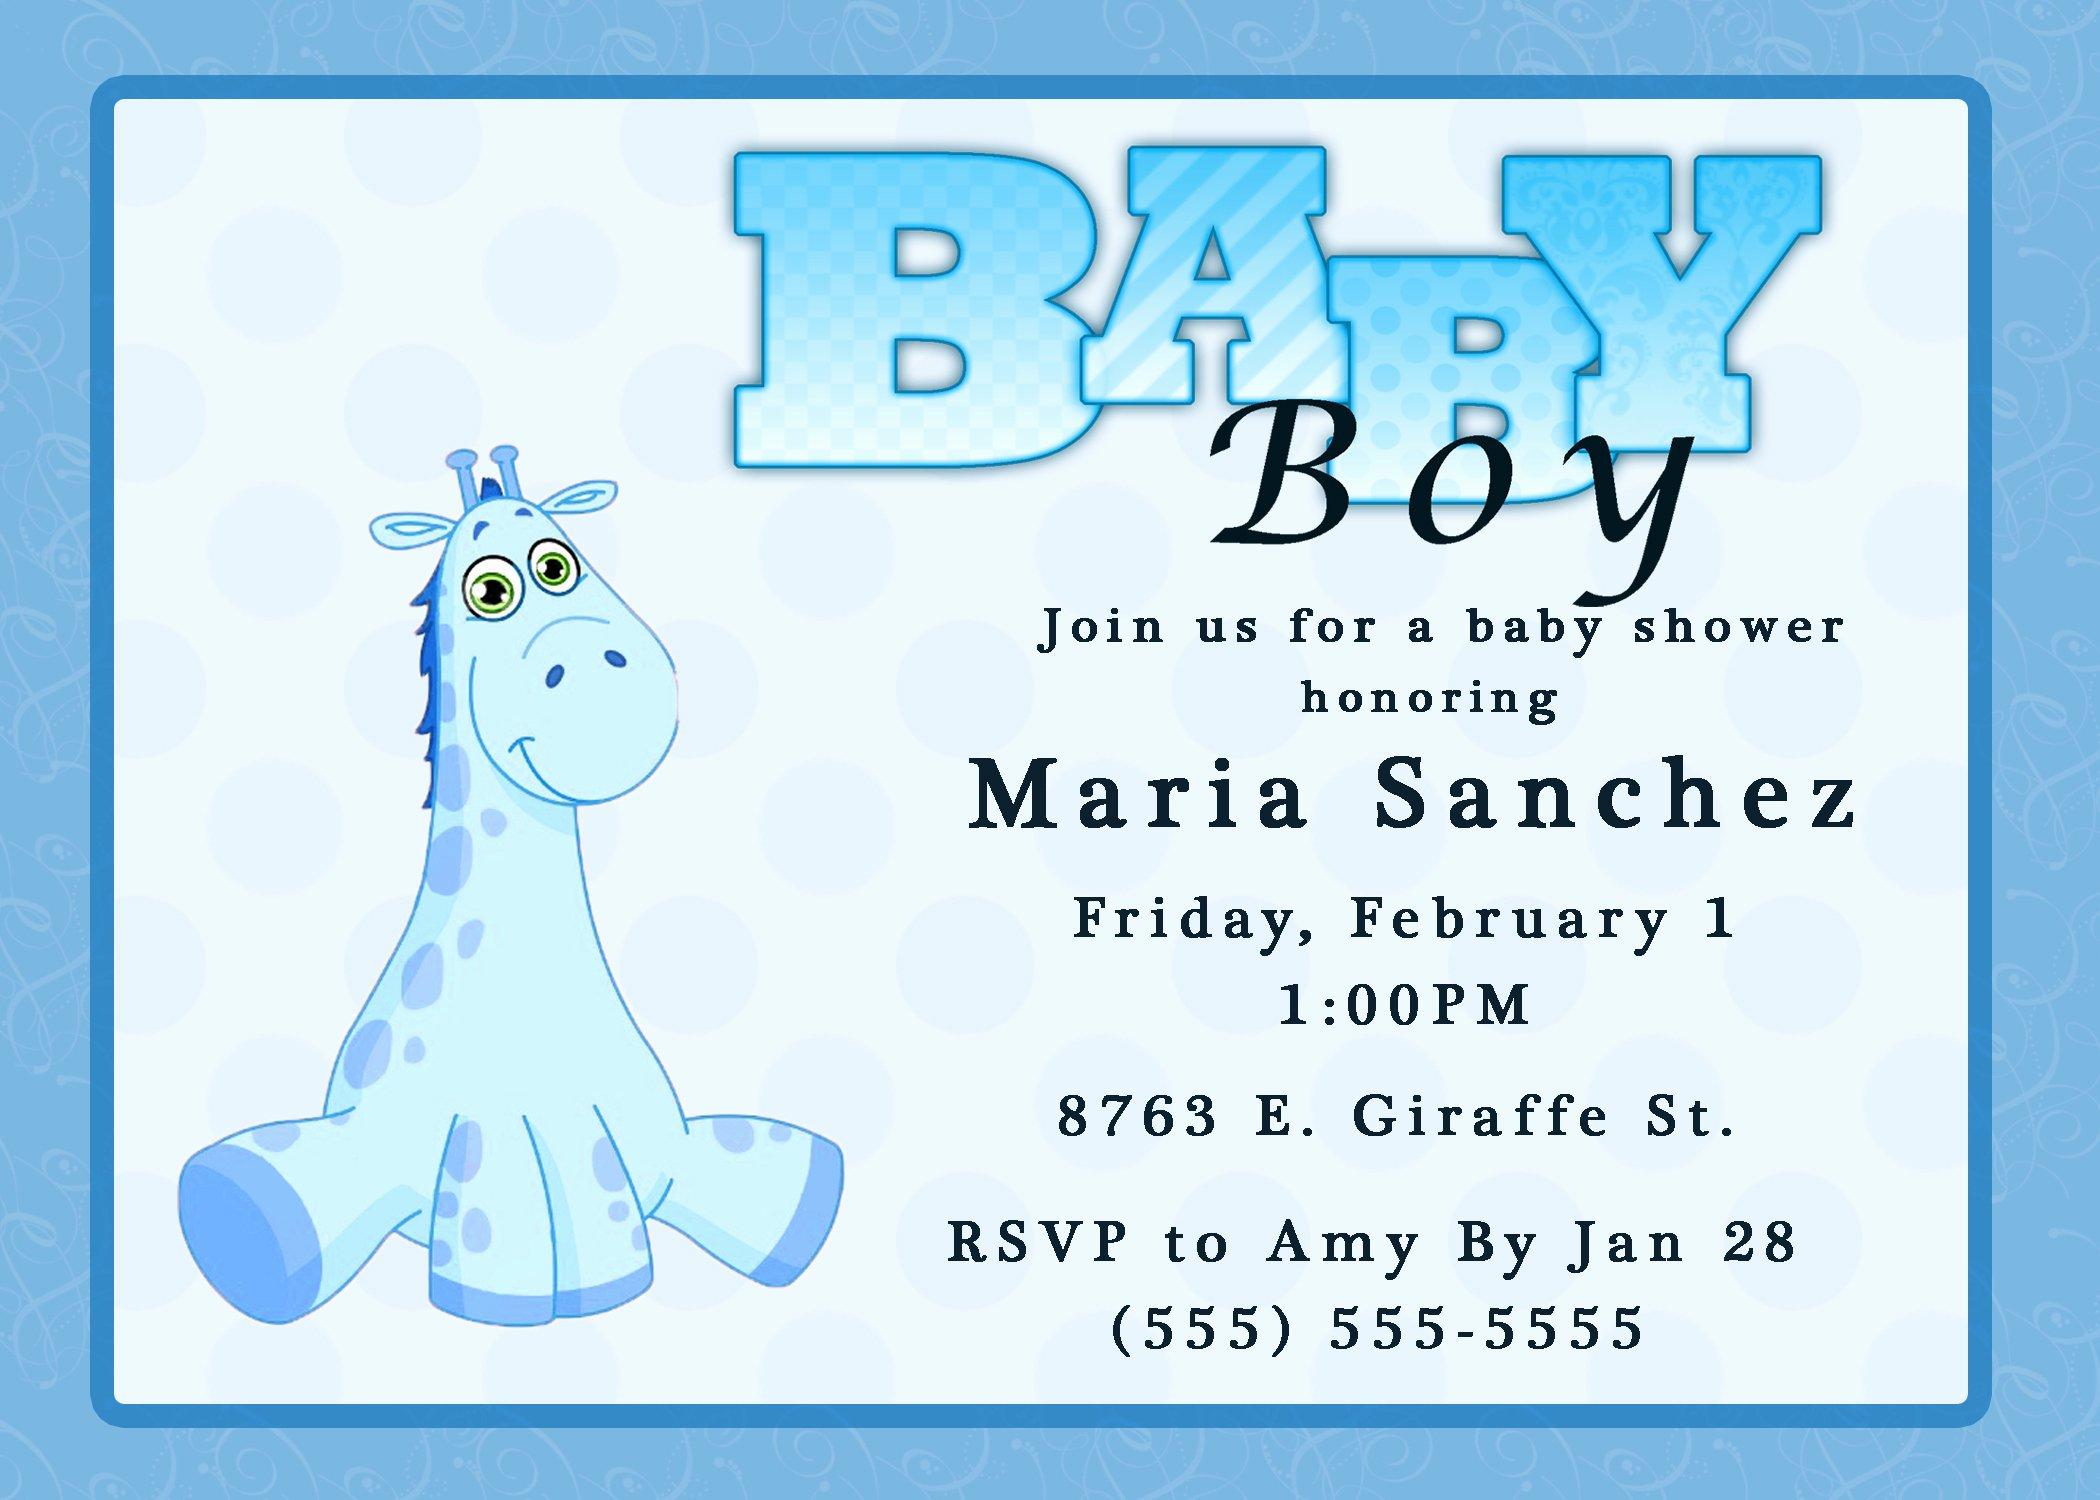 Baby Shower Invite Template Beautiful Baby Shower Invitations